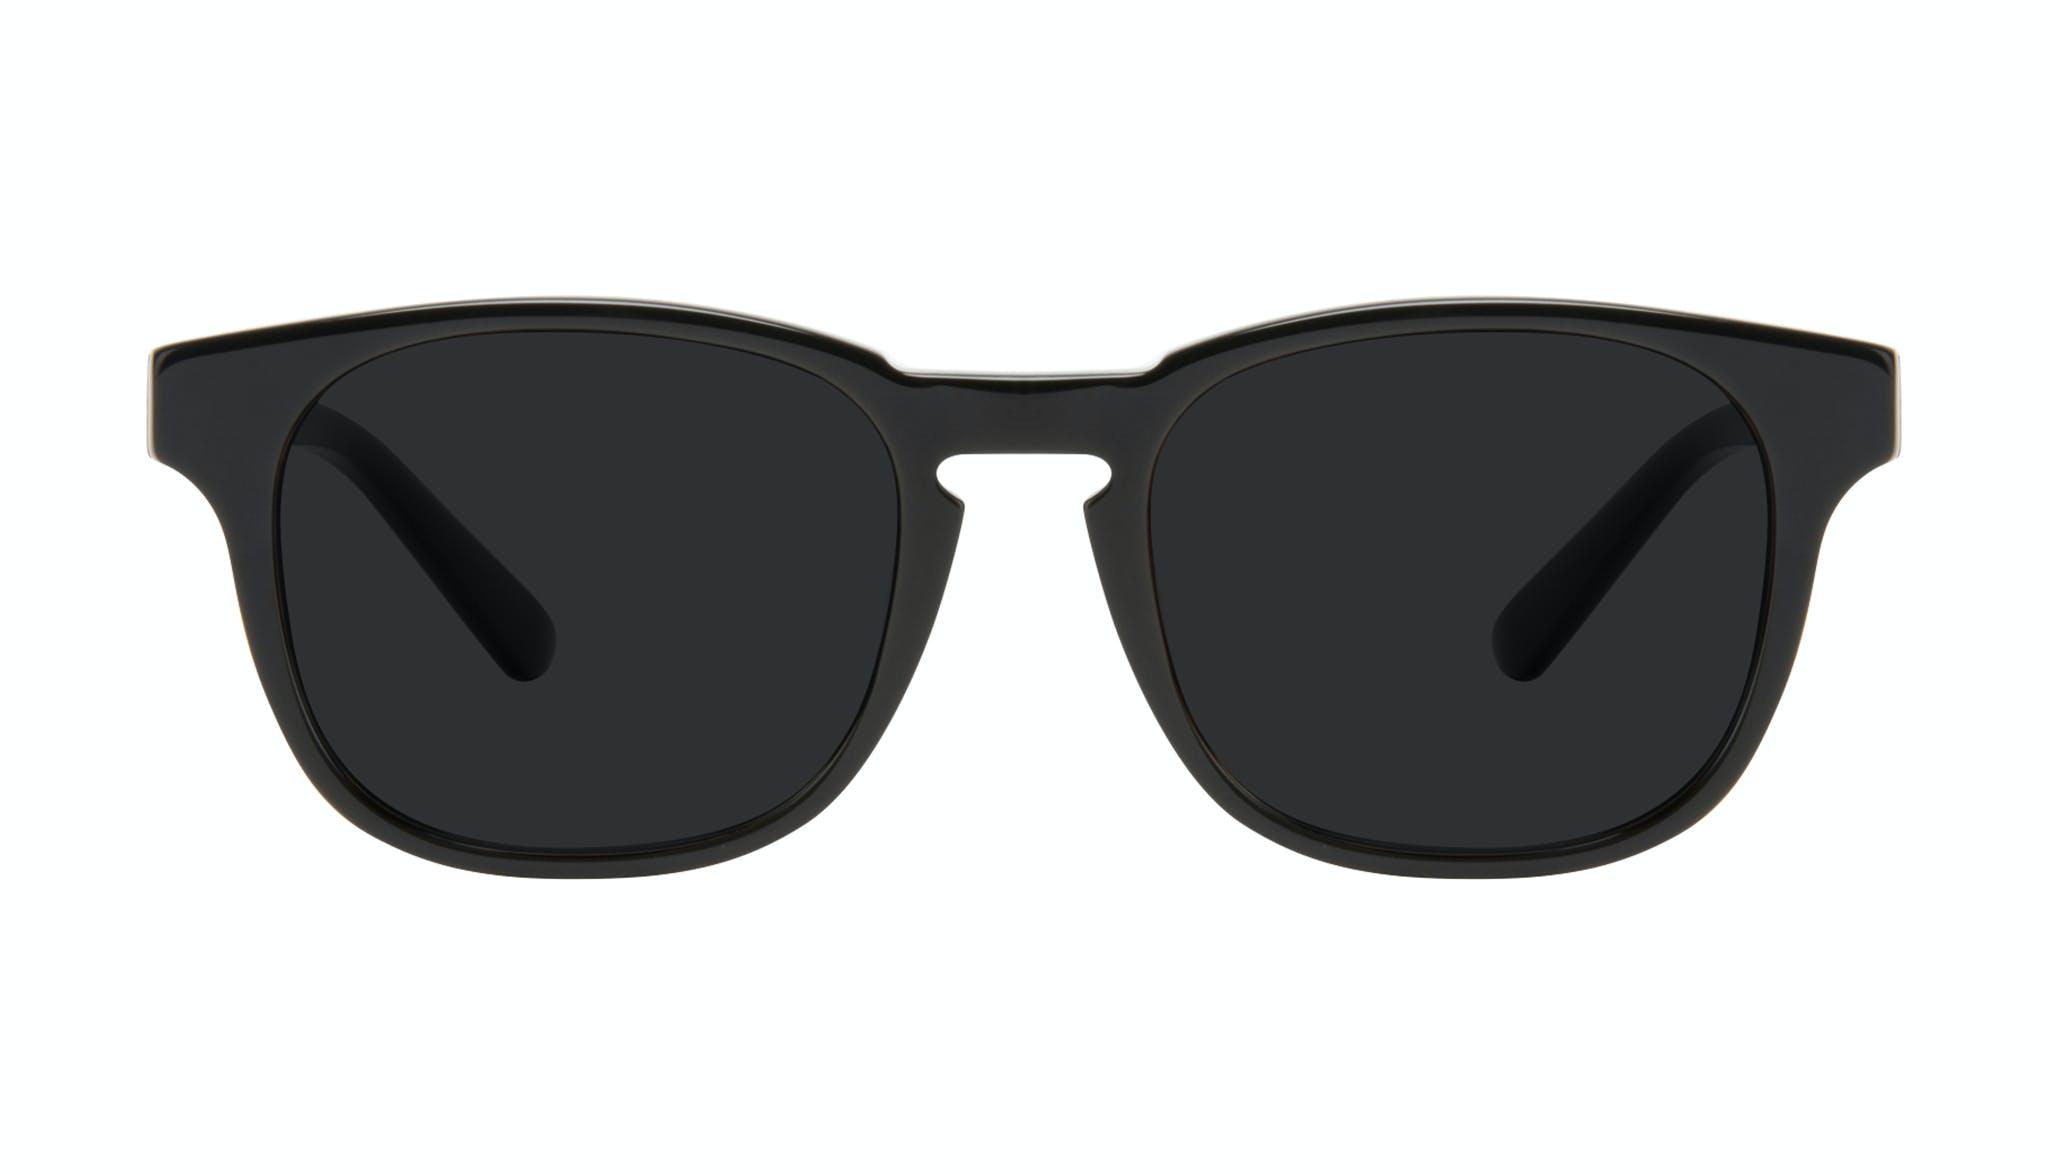 Affordable Fashion Glasses Square Sunglasses Men Outline Black Tort Front